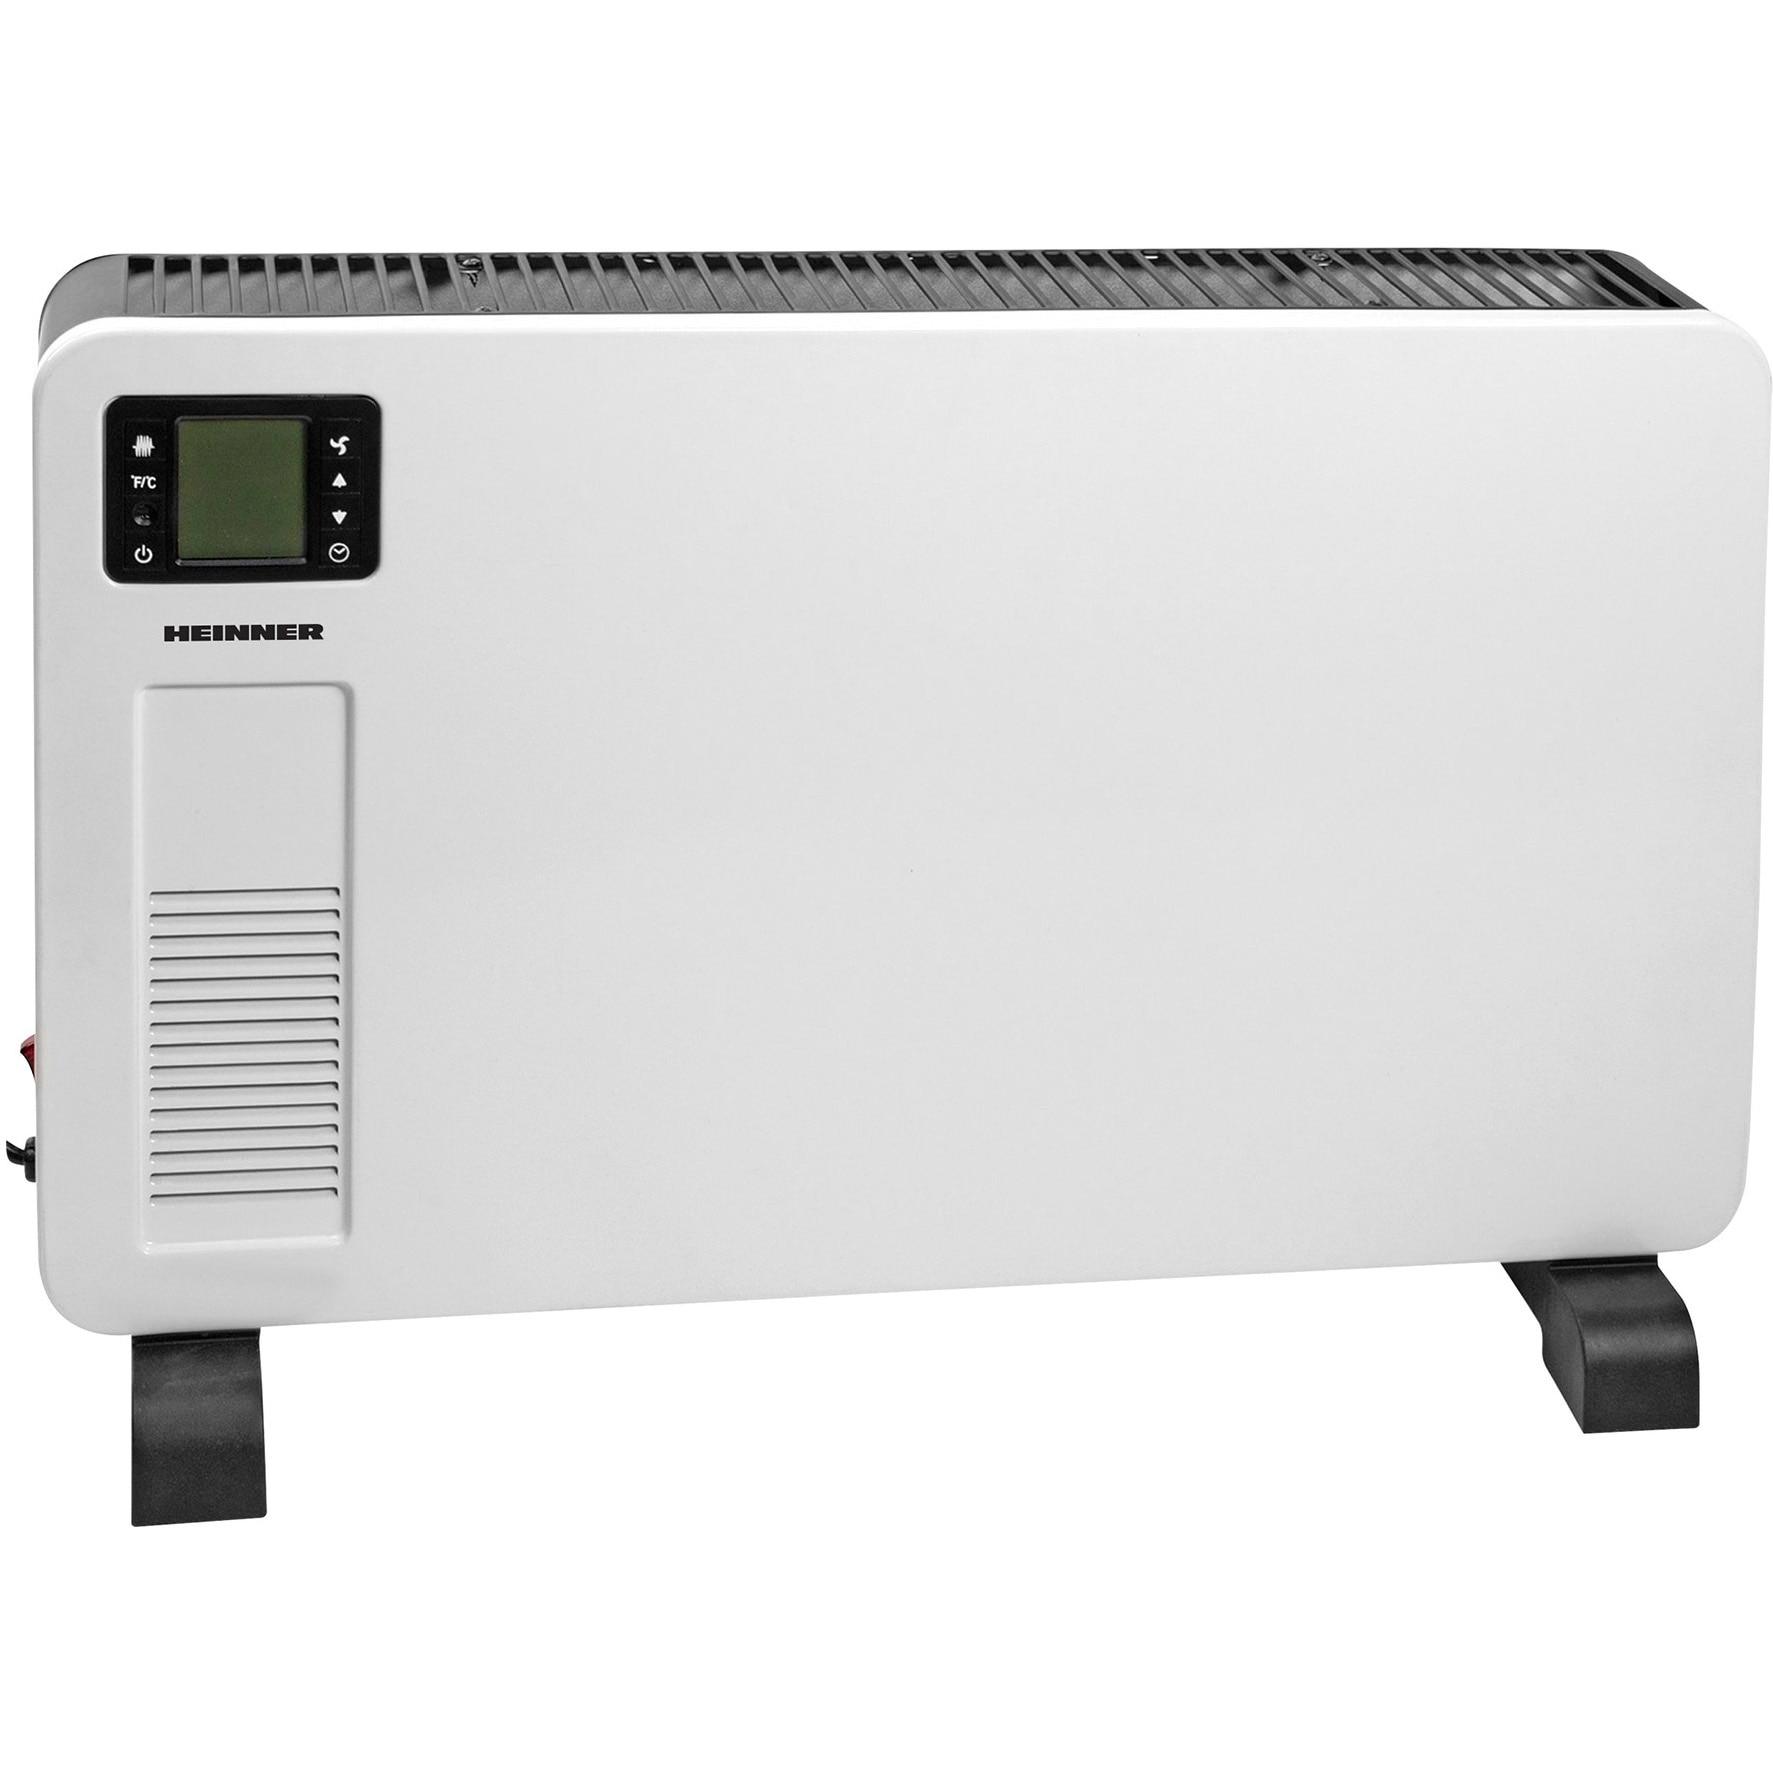 Fotografie Convector electric Heinner HCVH-Y2300D, 2300 W, display LCD, timer, termostat reglabil, protectie supraincalzire, alb